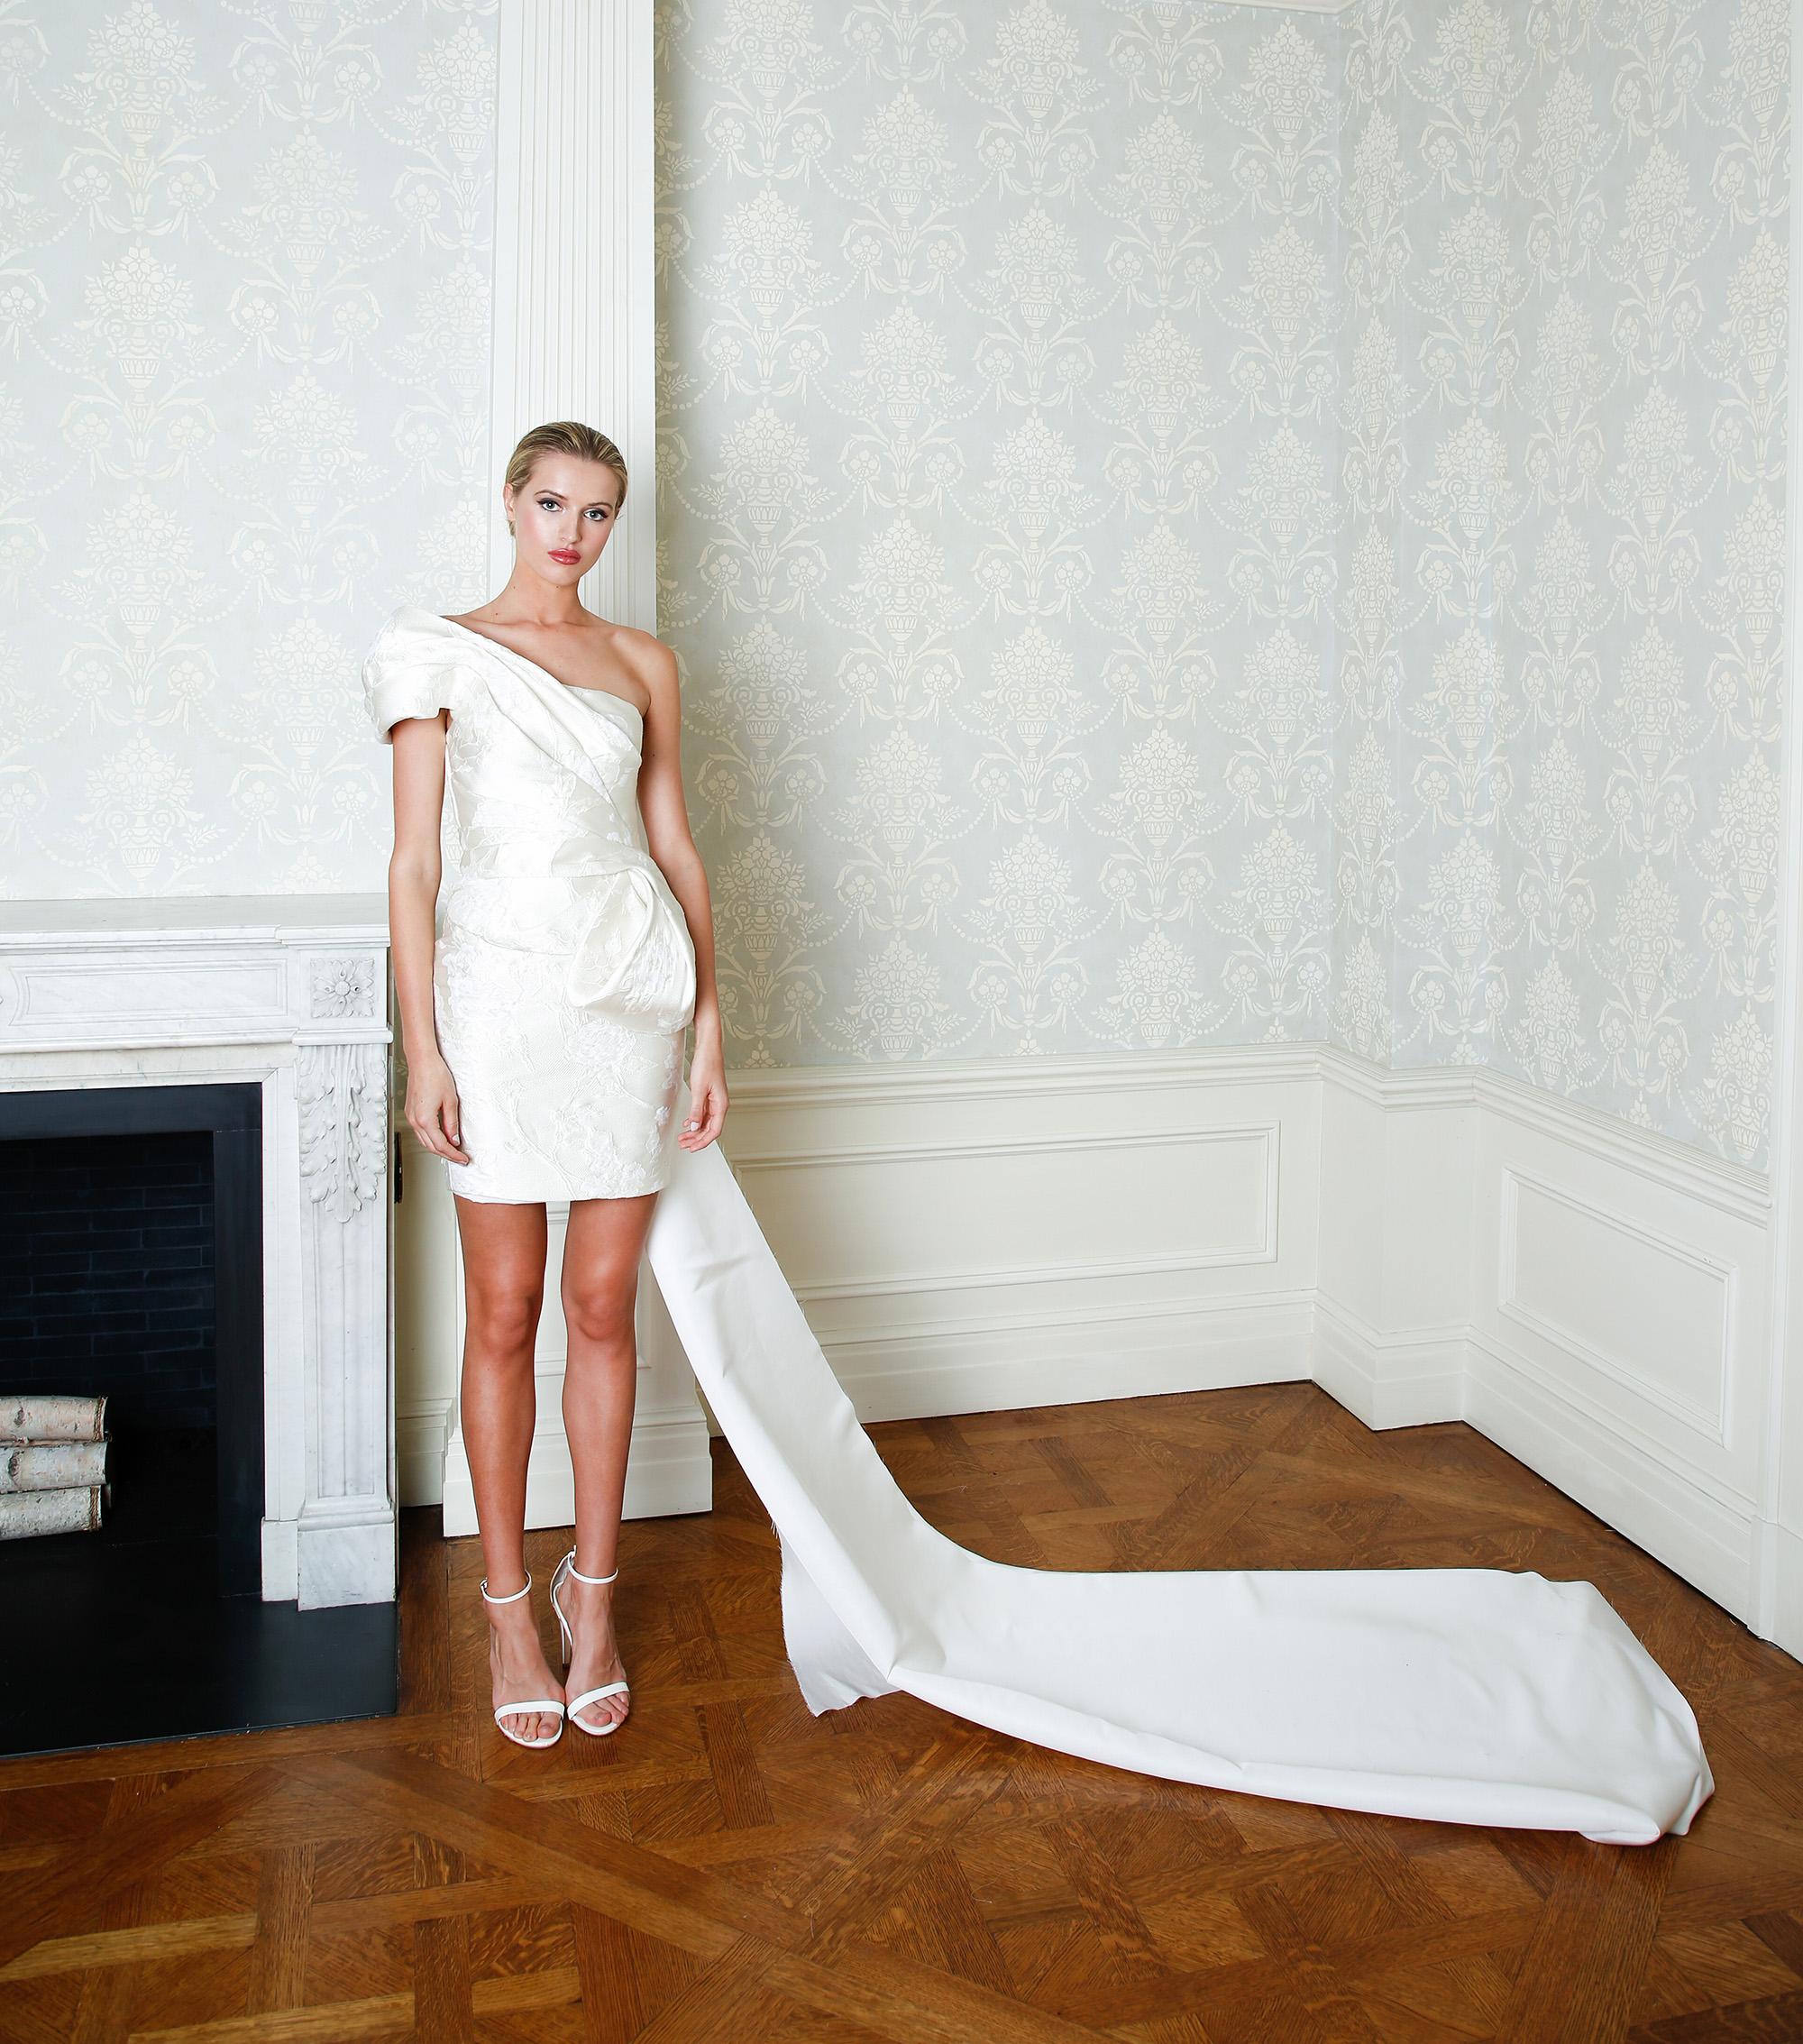 Cristina Ottaviano wedding dress spring 2019 short one shoulder gown with train